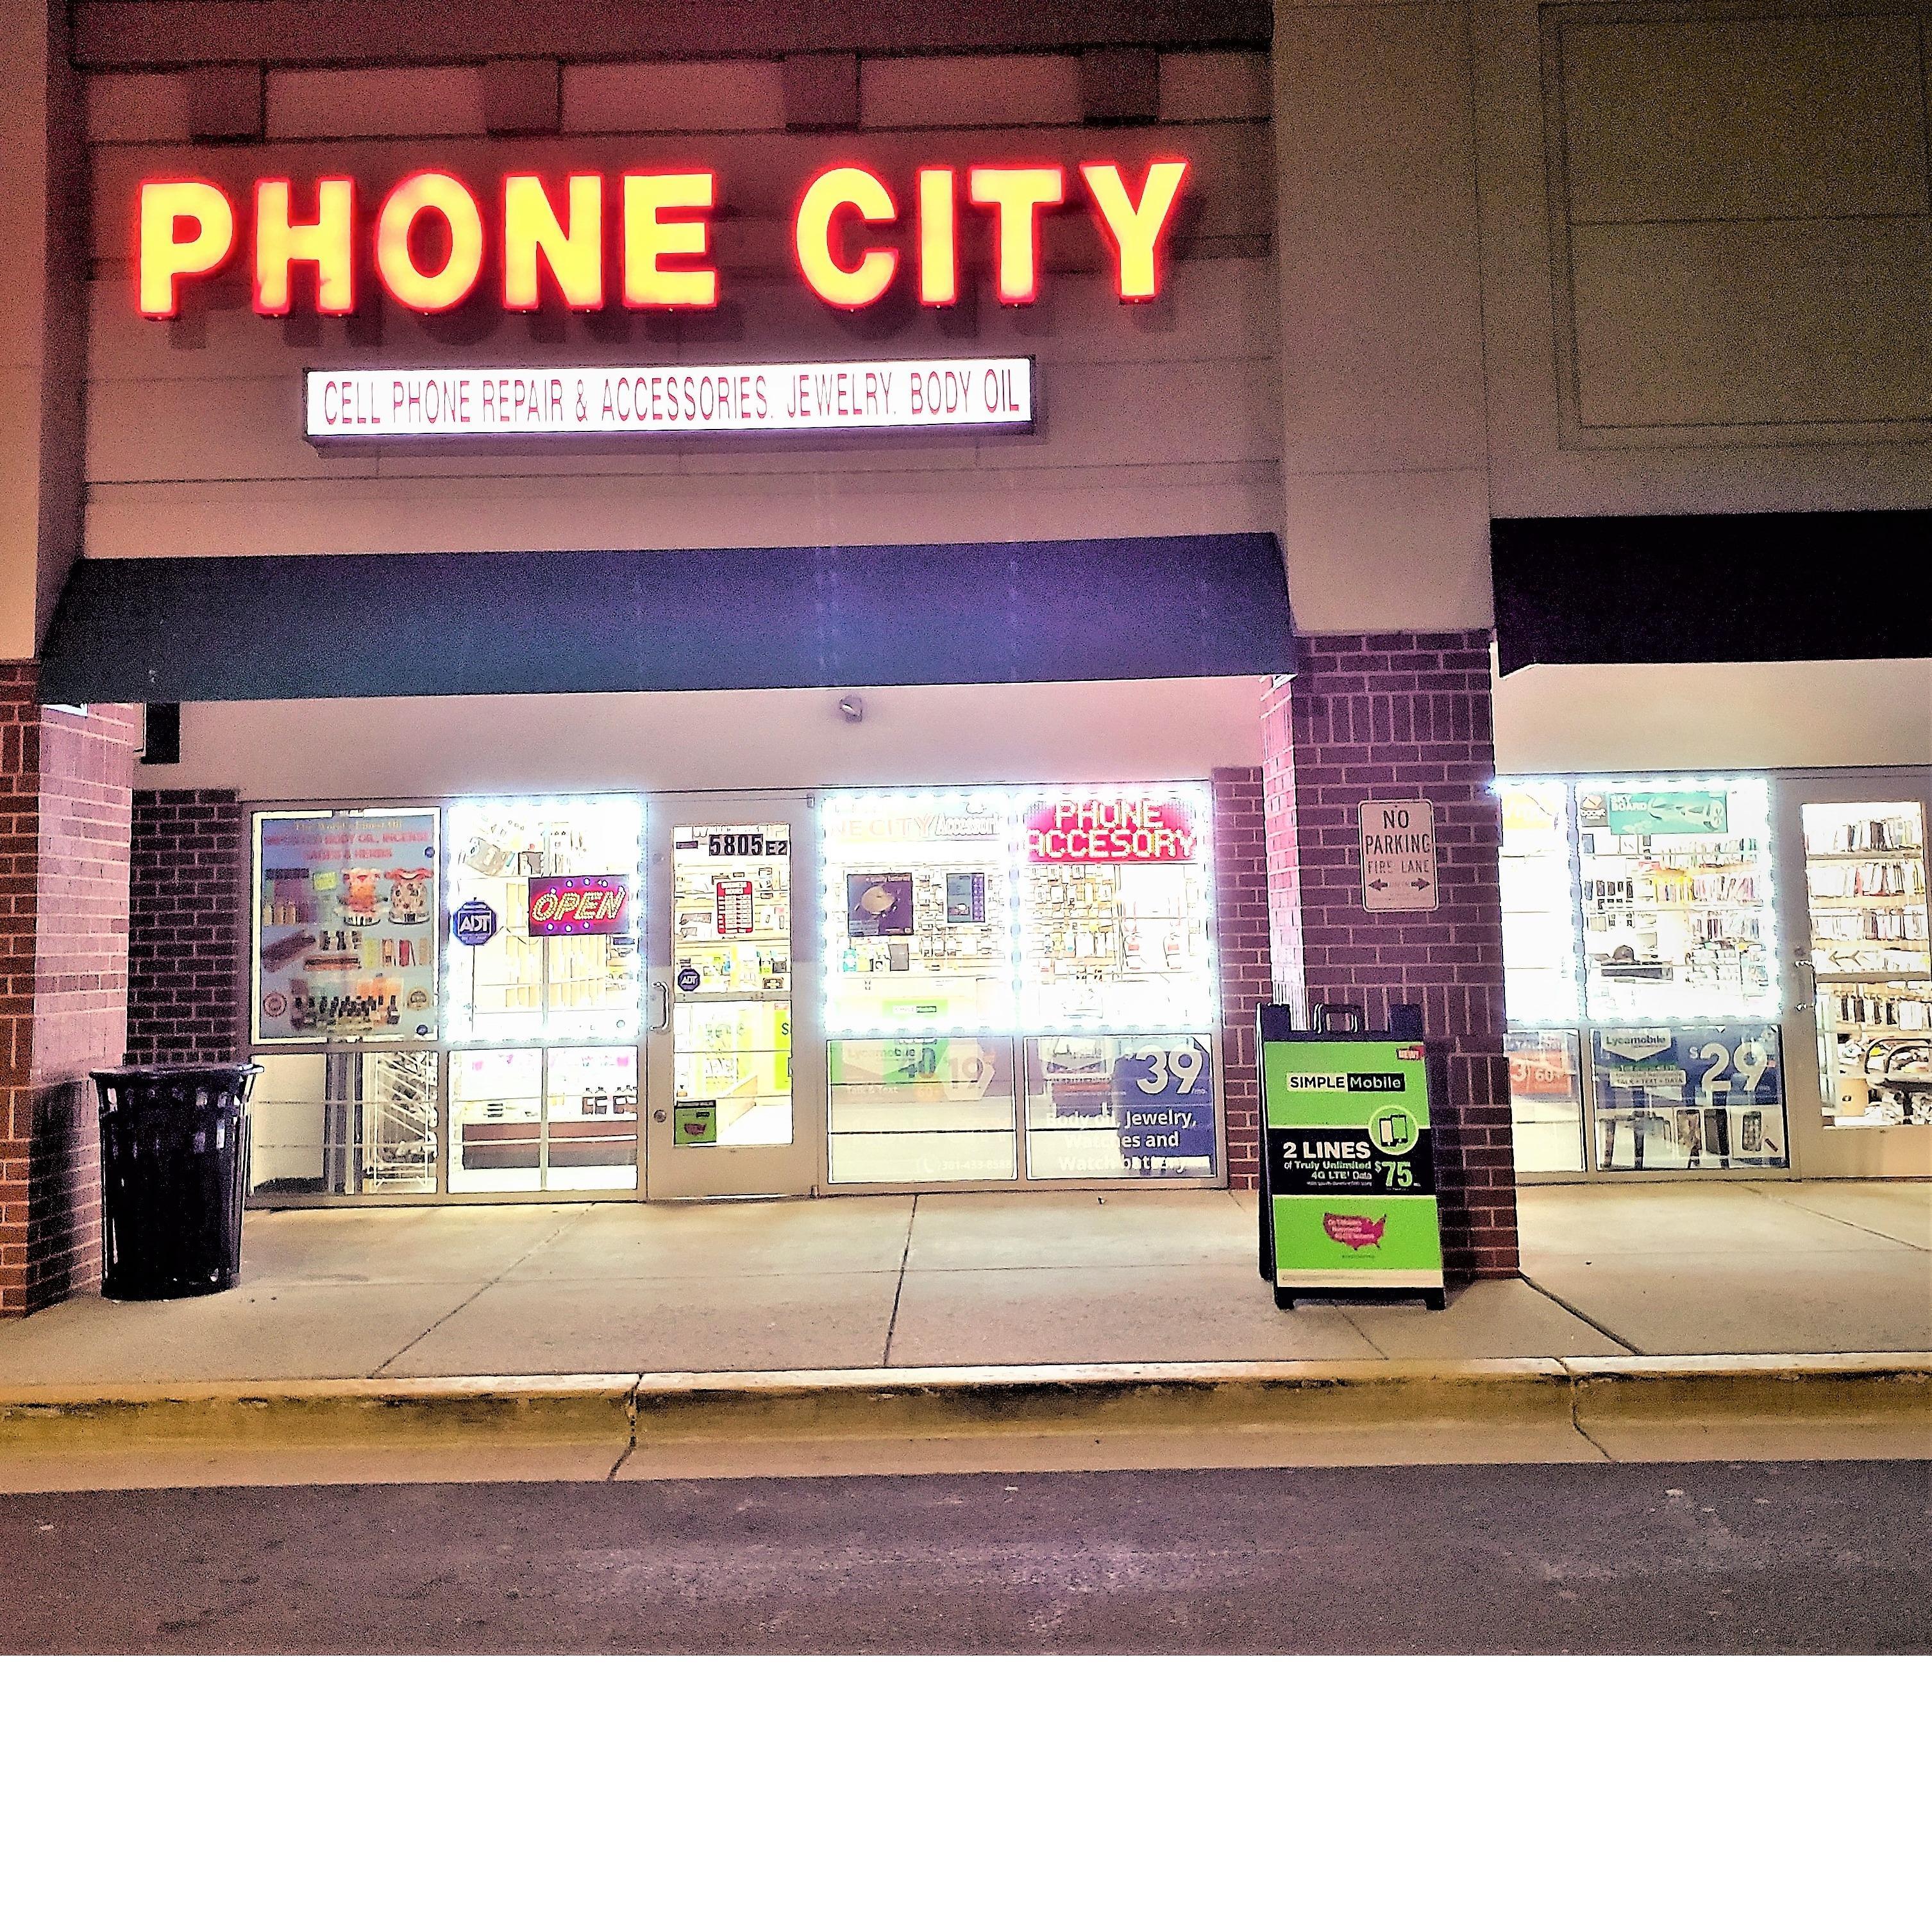 Phone City - iPhone Screen Repair/iPad Repair & Samsung Galaxy Phone Fixing Store in District Heights, MD